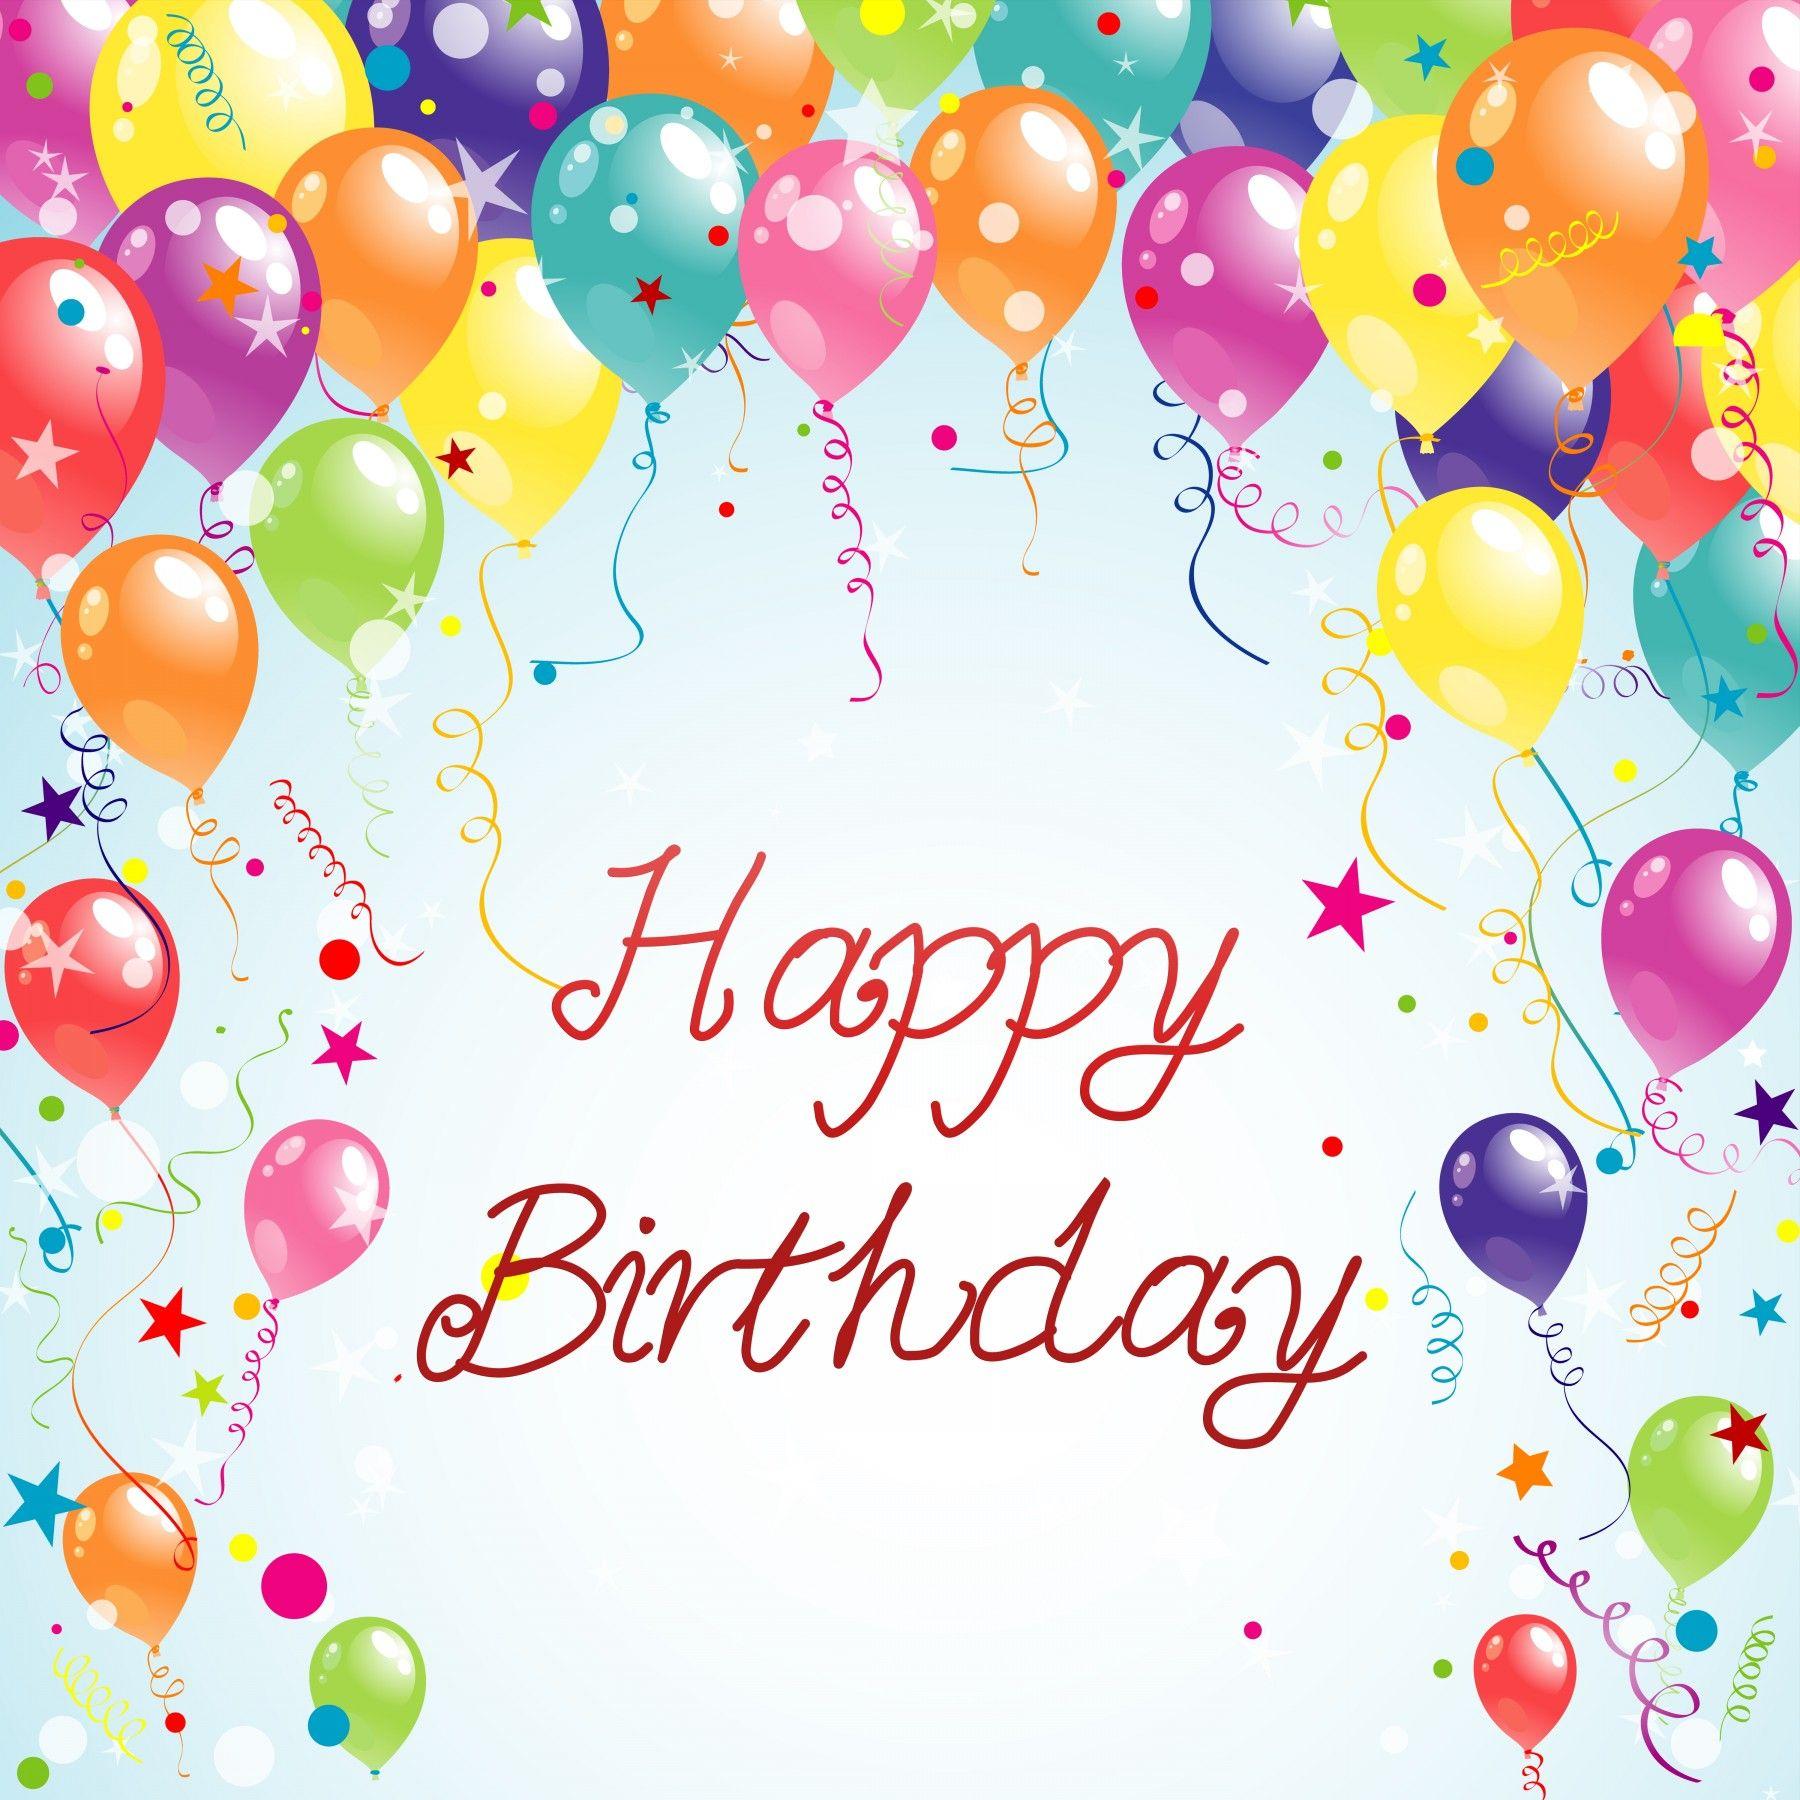 birthday cards images Happy Birthday Pinterest